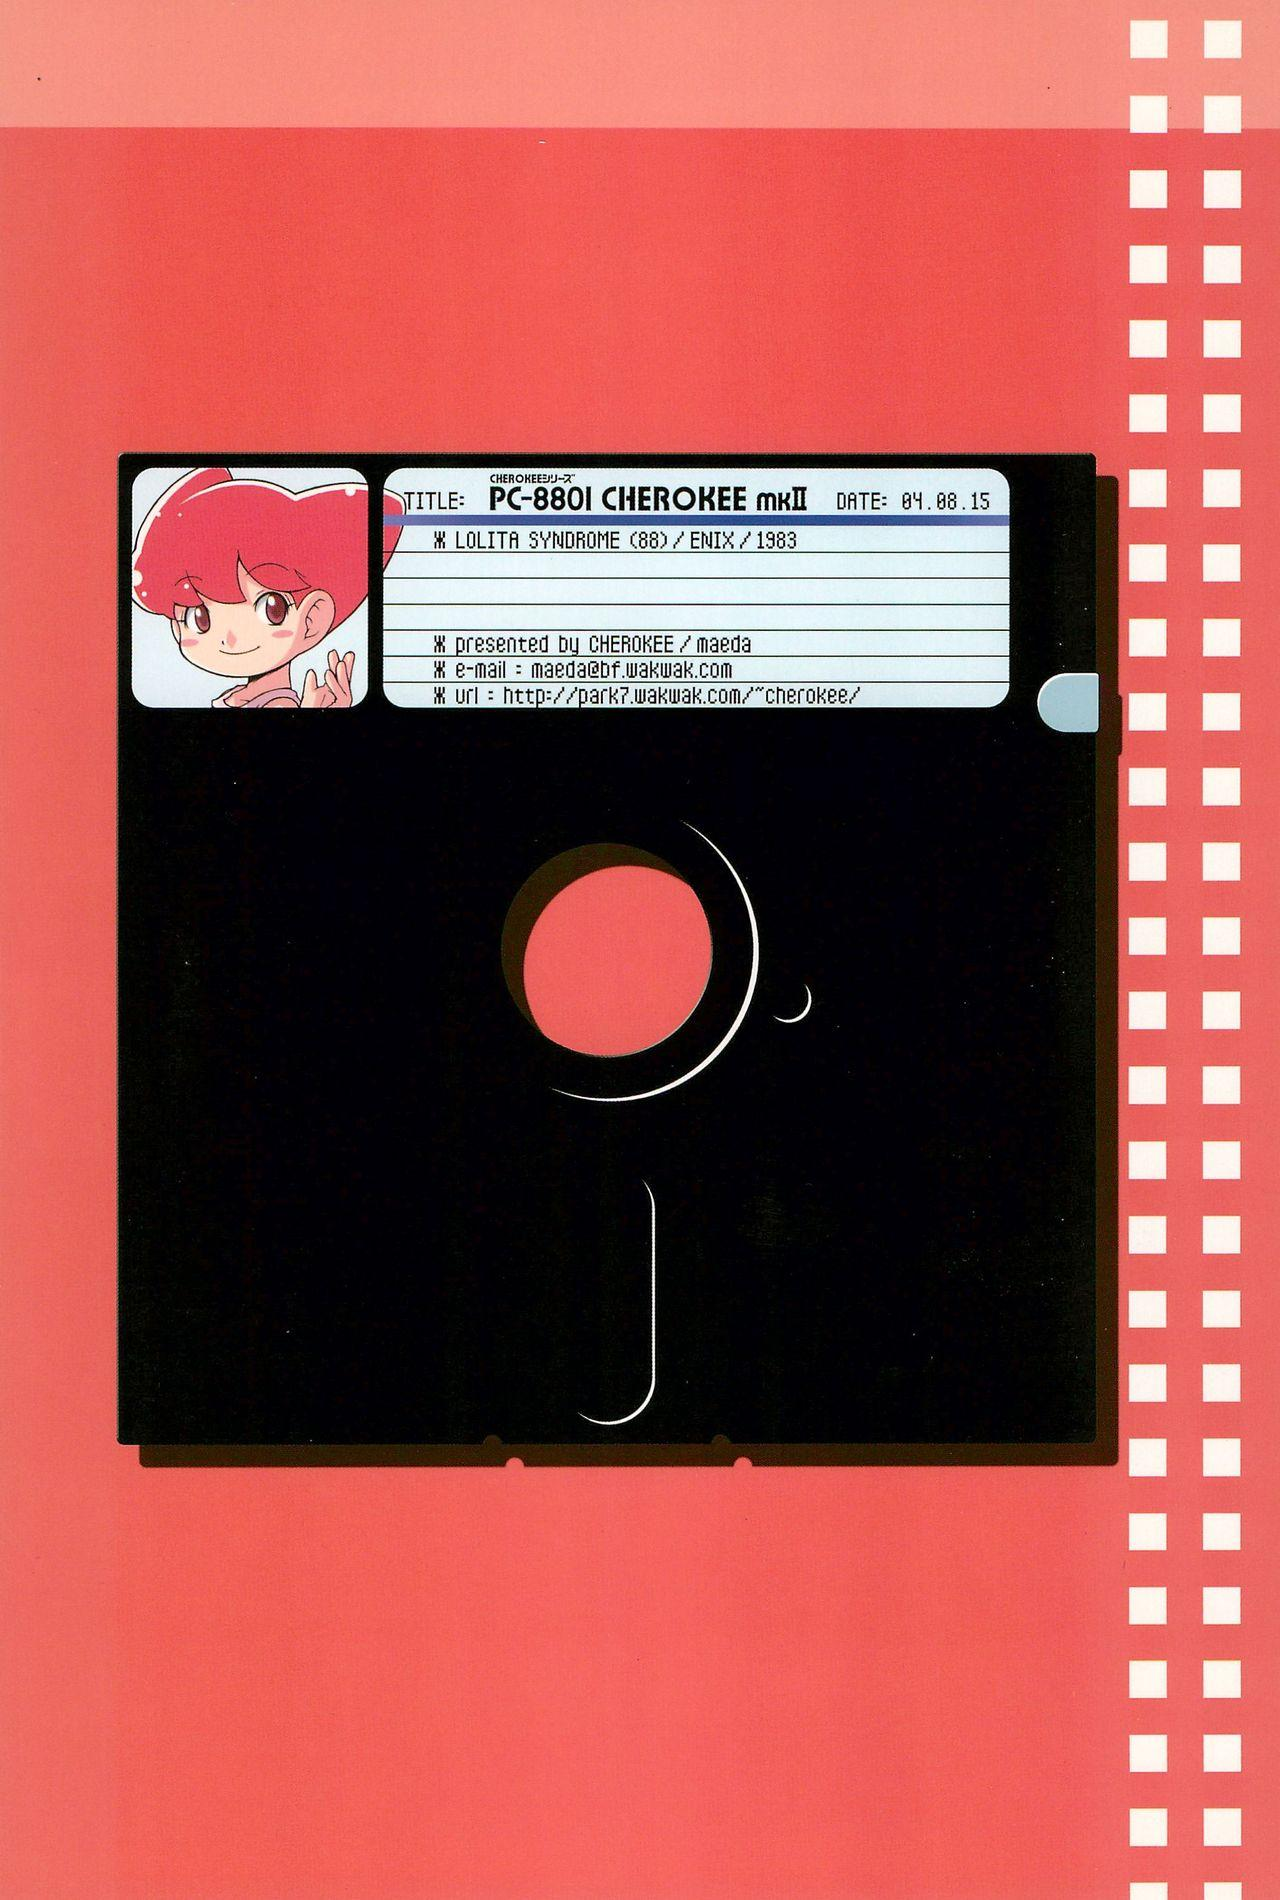 PC-8801 CHEROKEE mk2 23